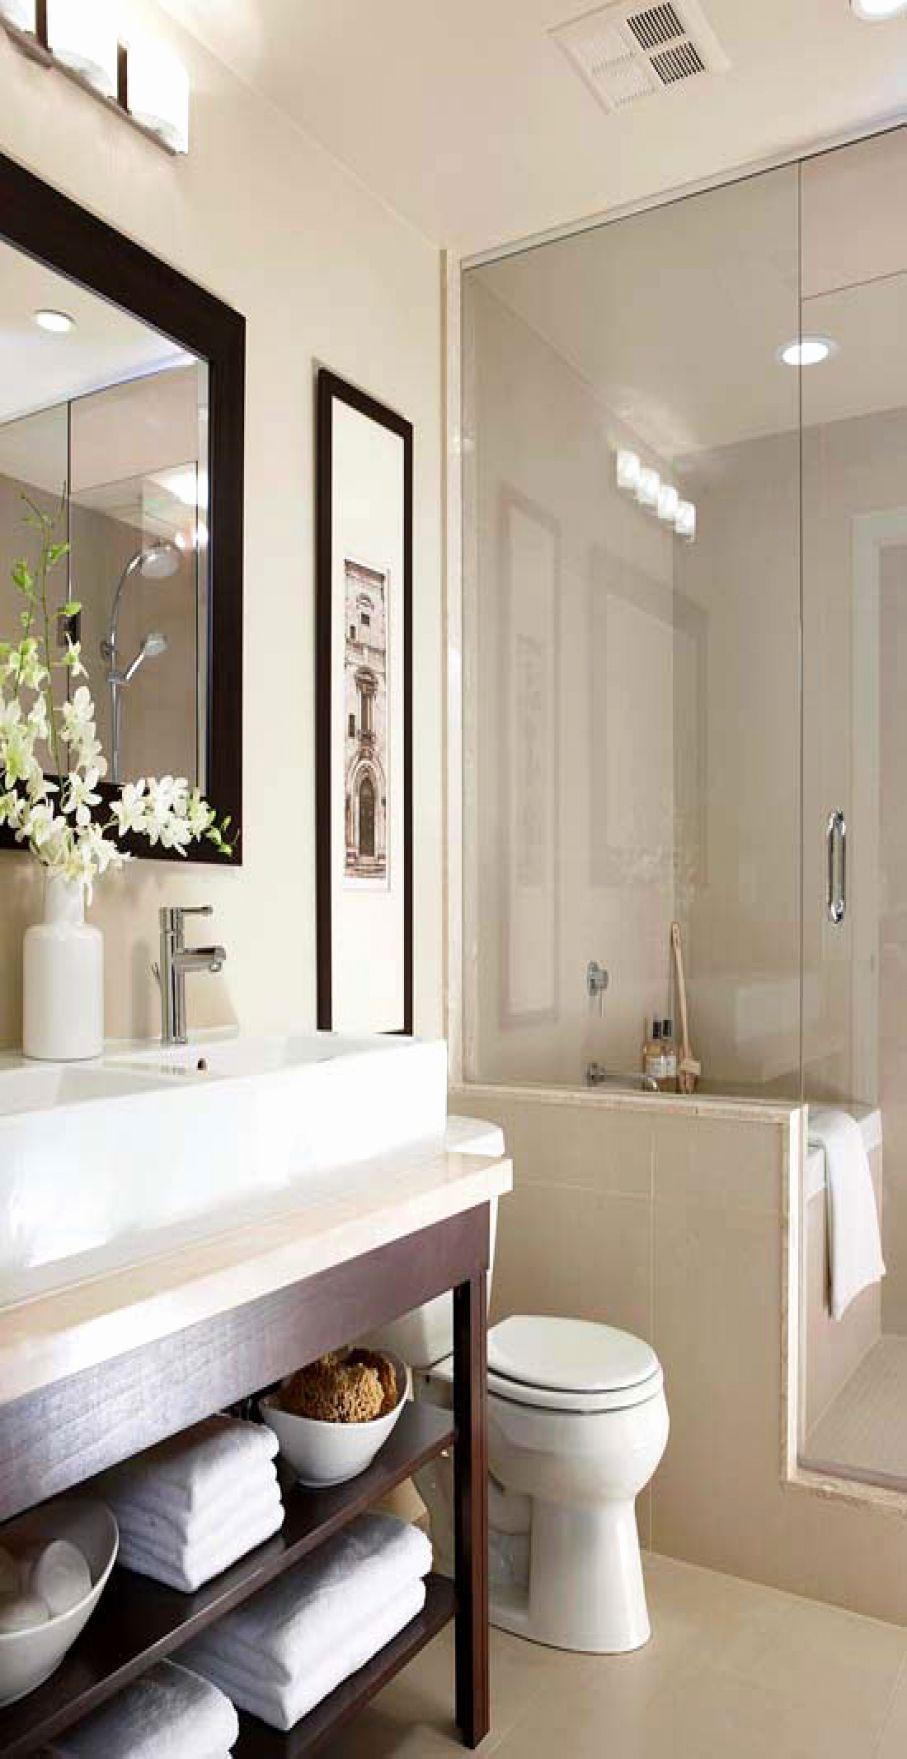 47 beautiful spa bathroom decorating ideas in 2020 | bathroom design small, bathroom remodel